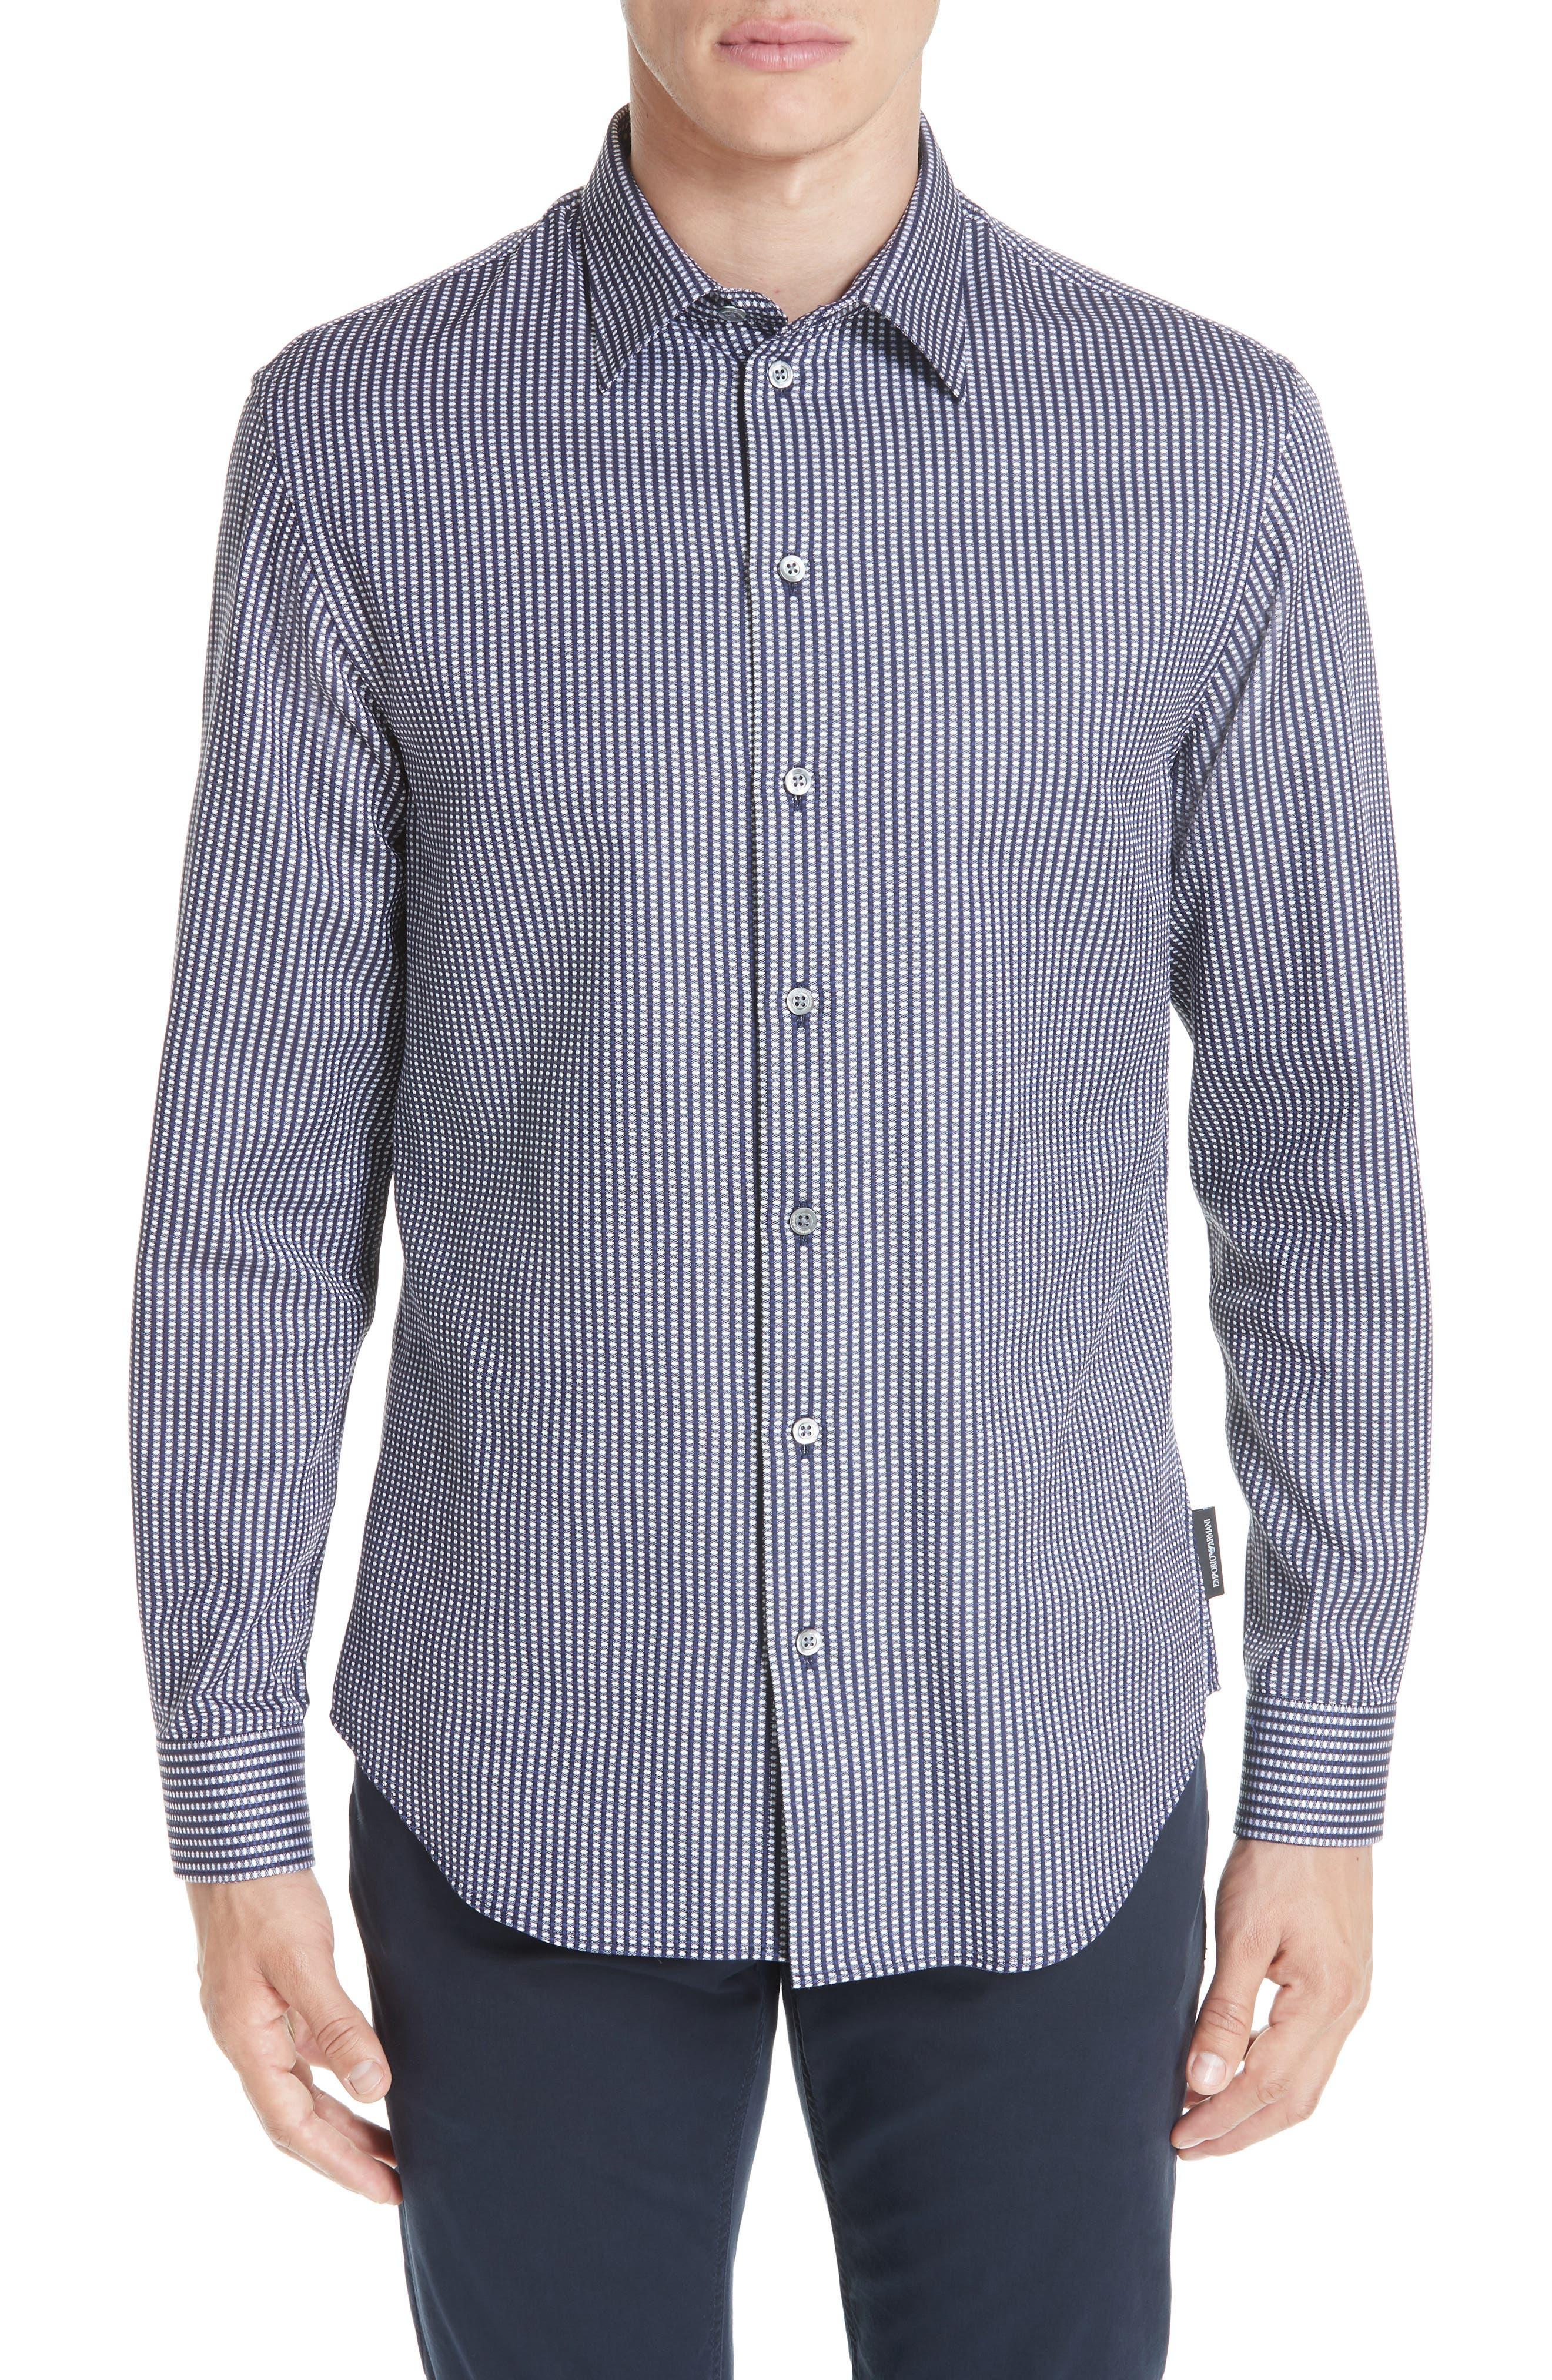 Regular Fit Solid Sport Shirt,                         Main,                         color, BLUE MULTI